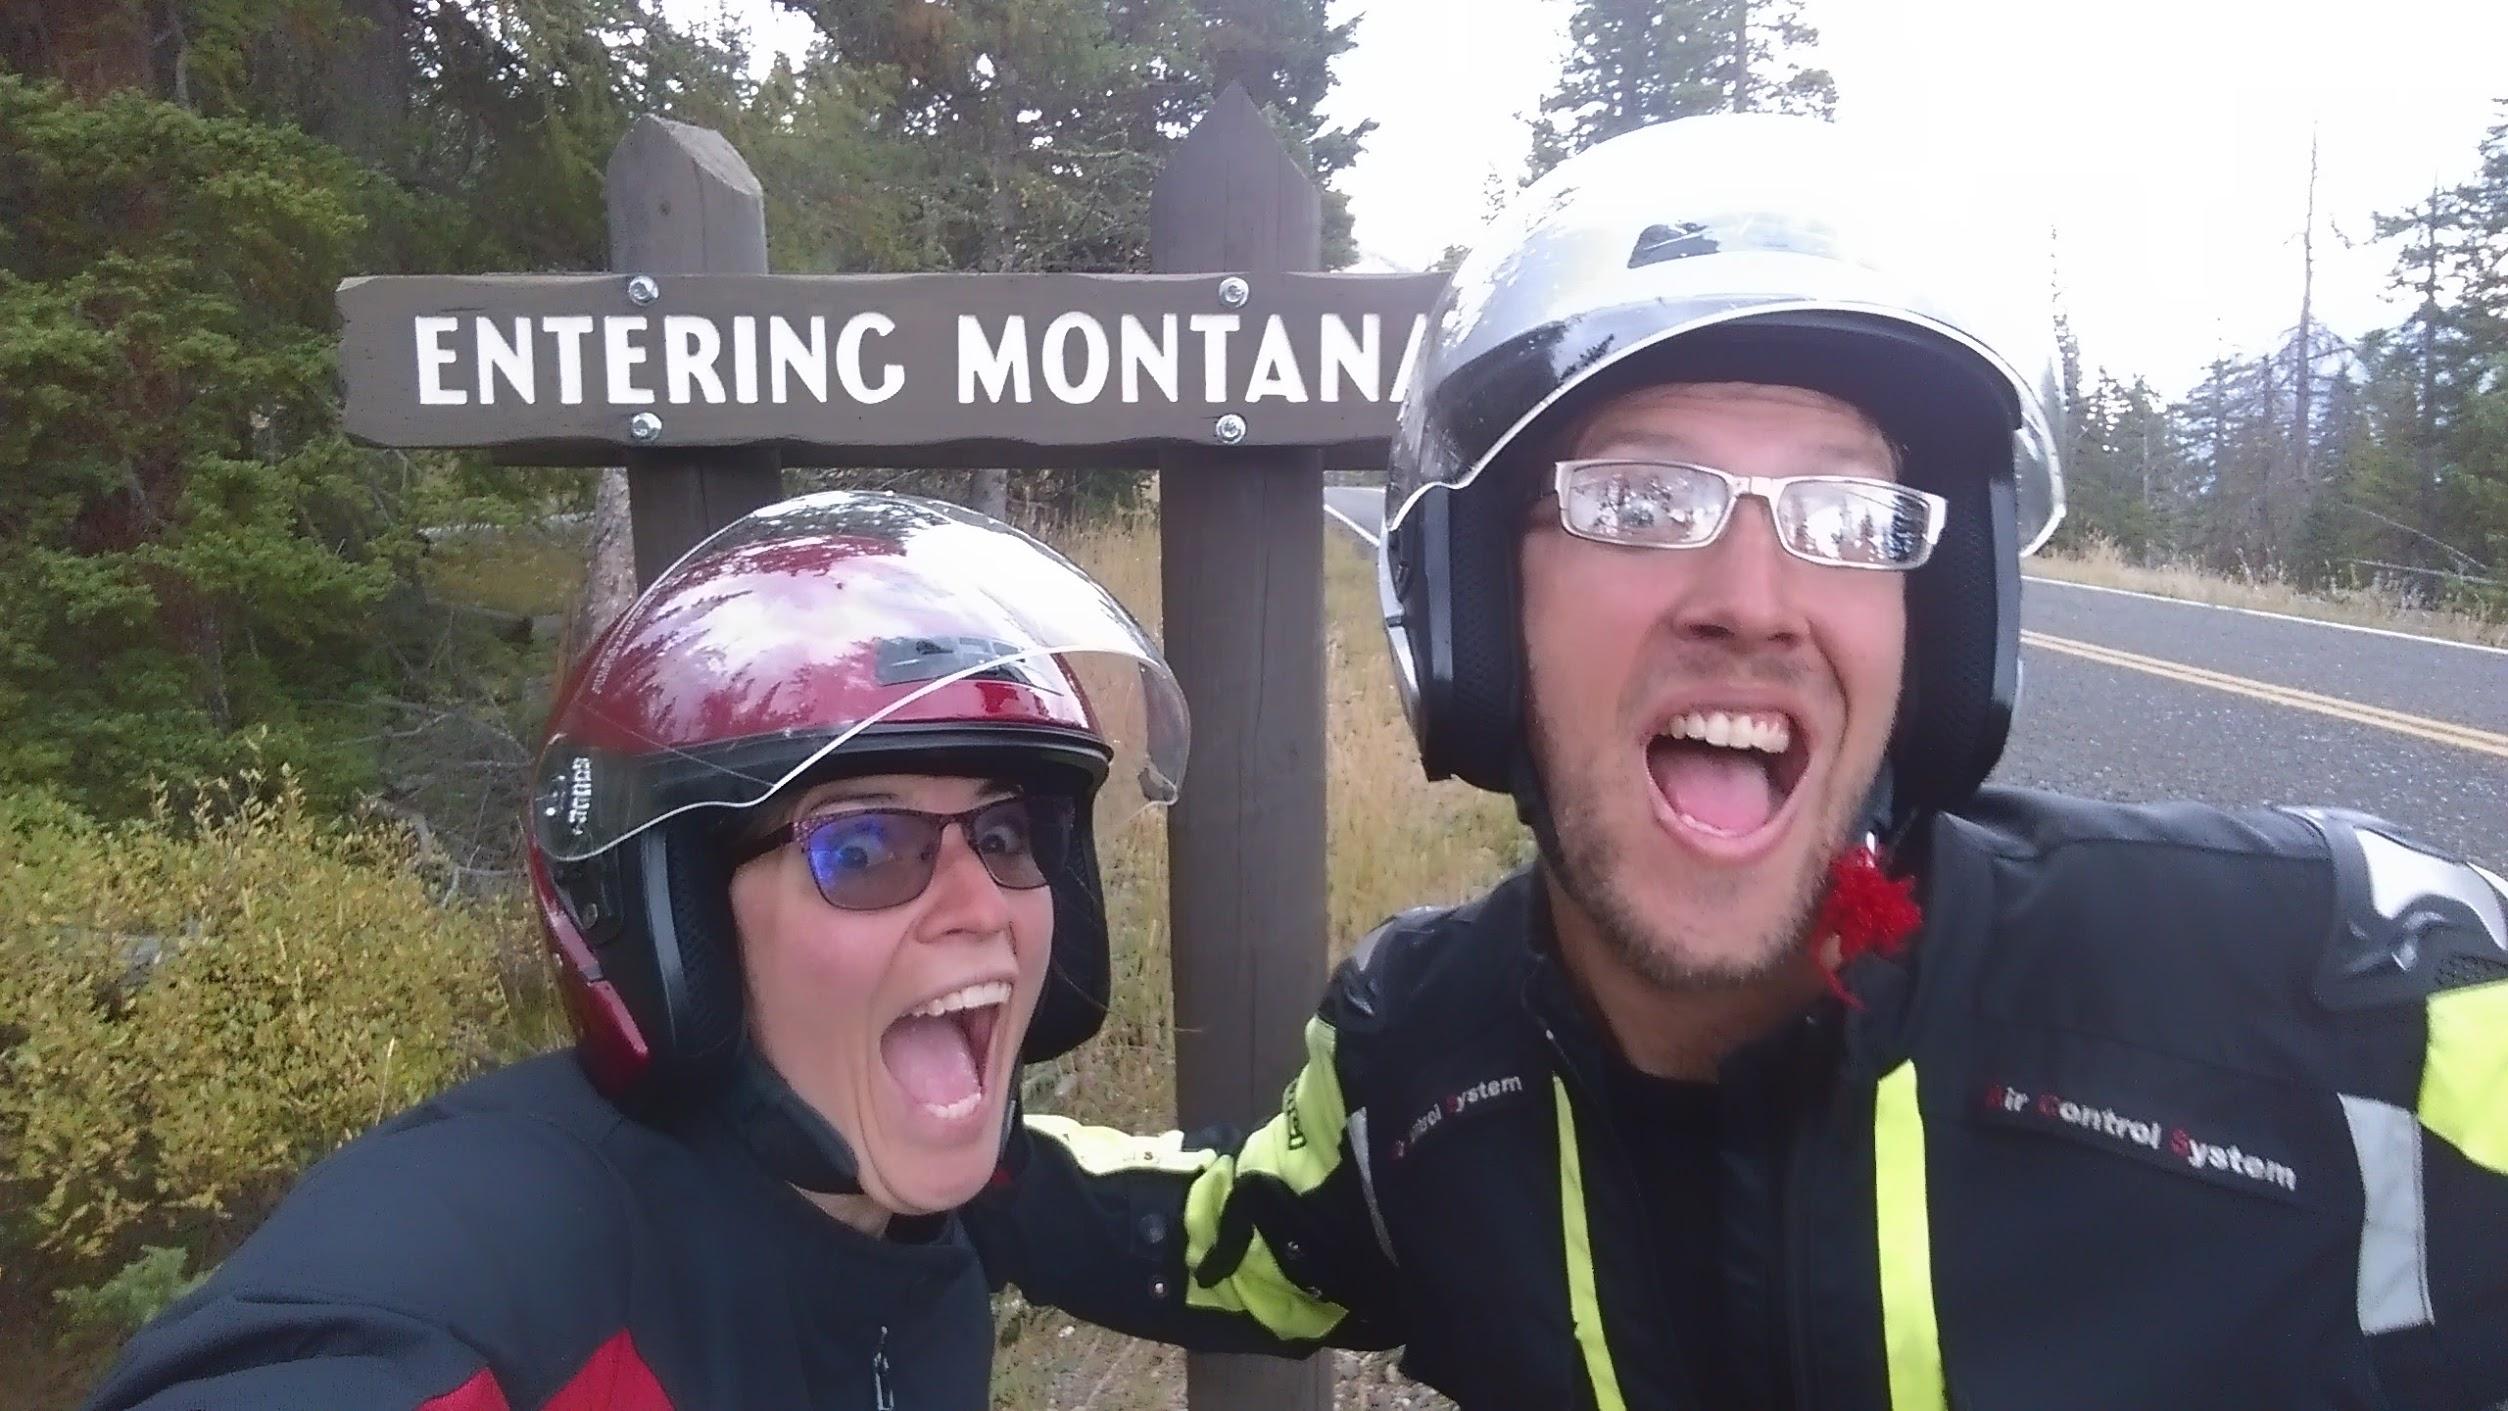 Montana!